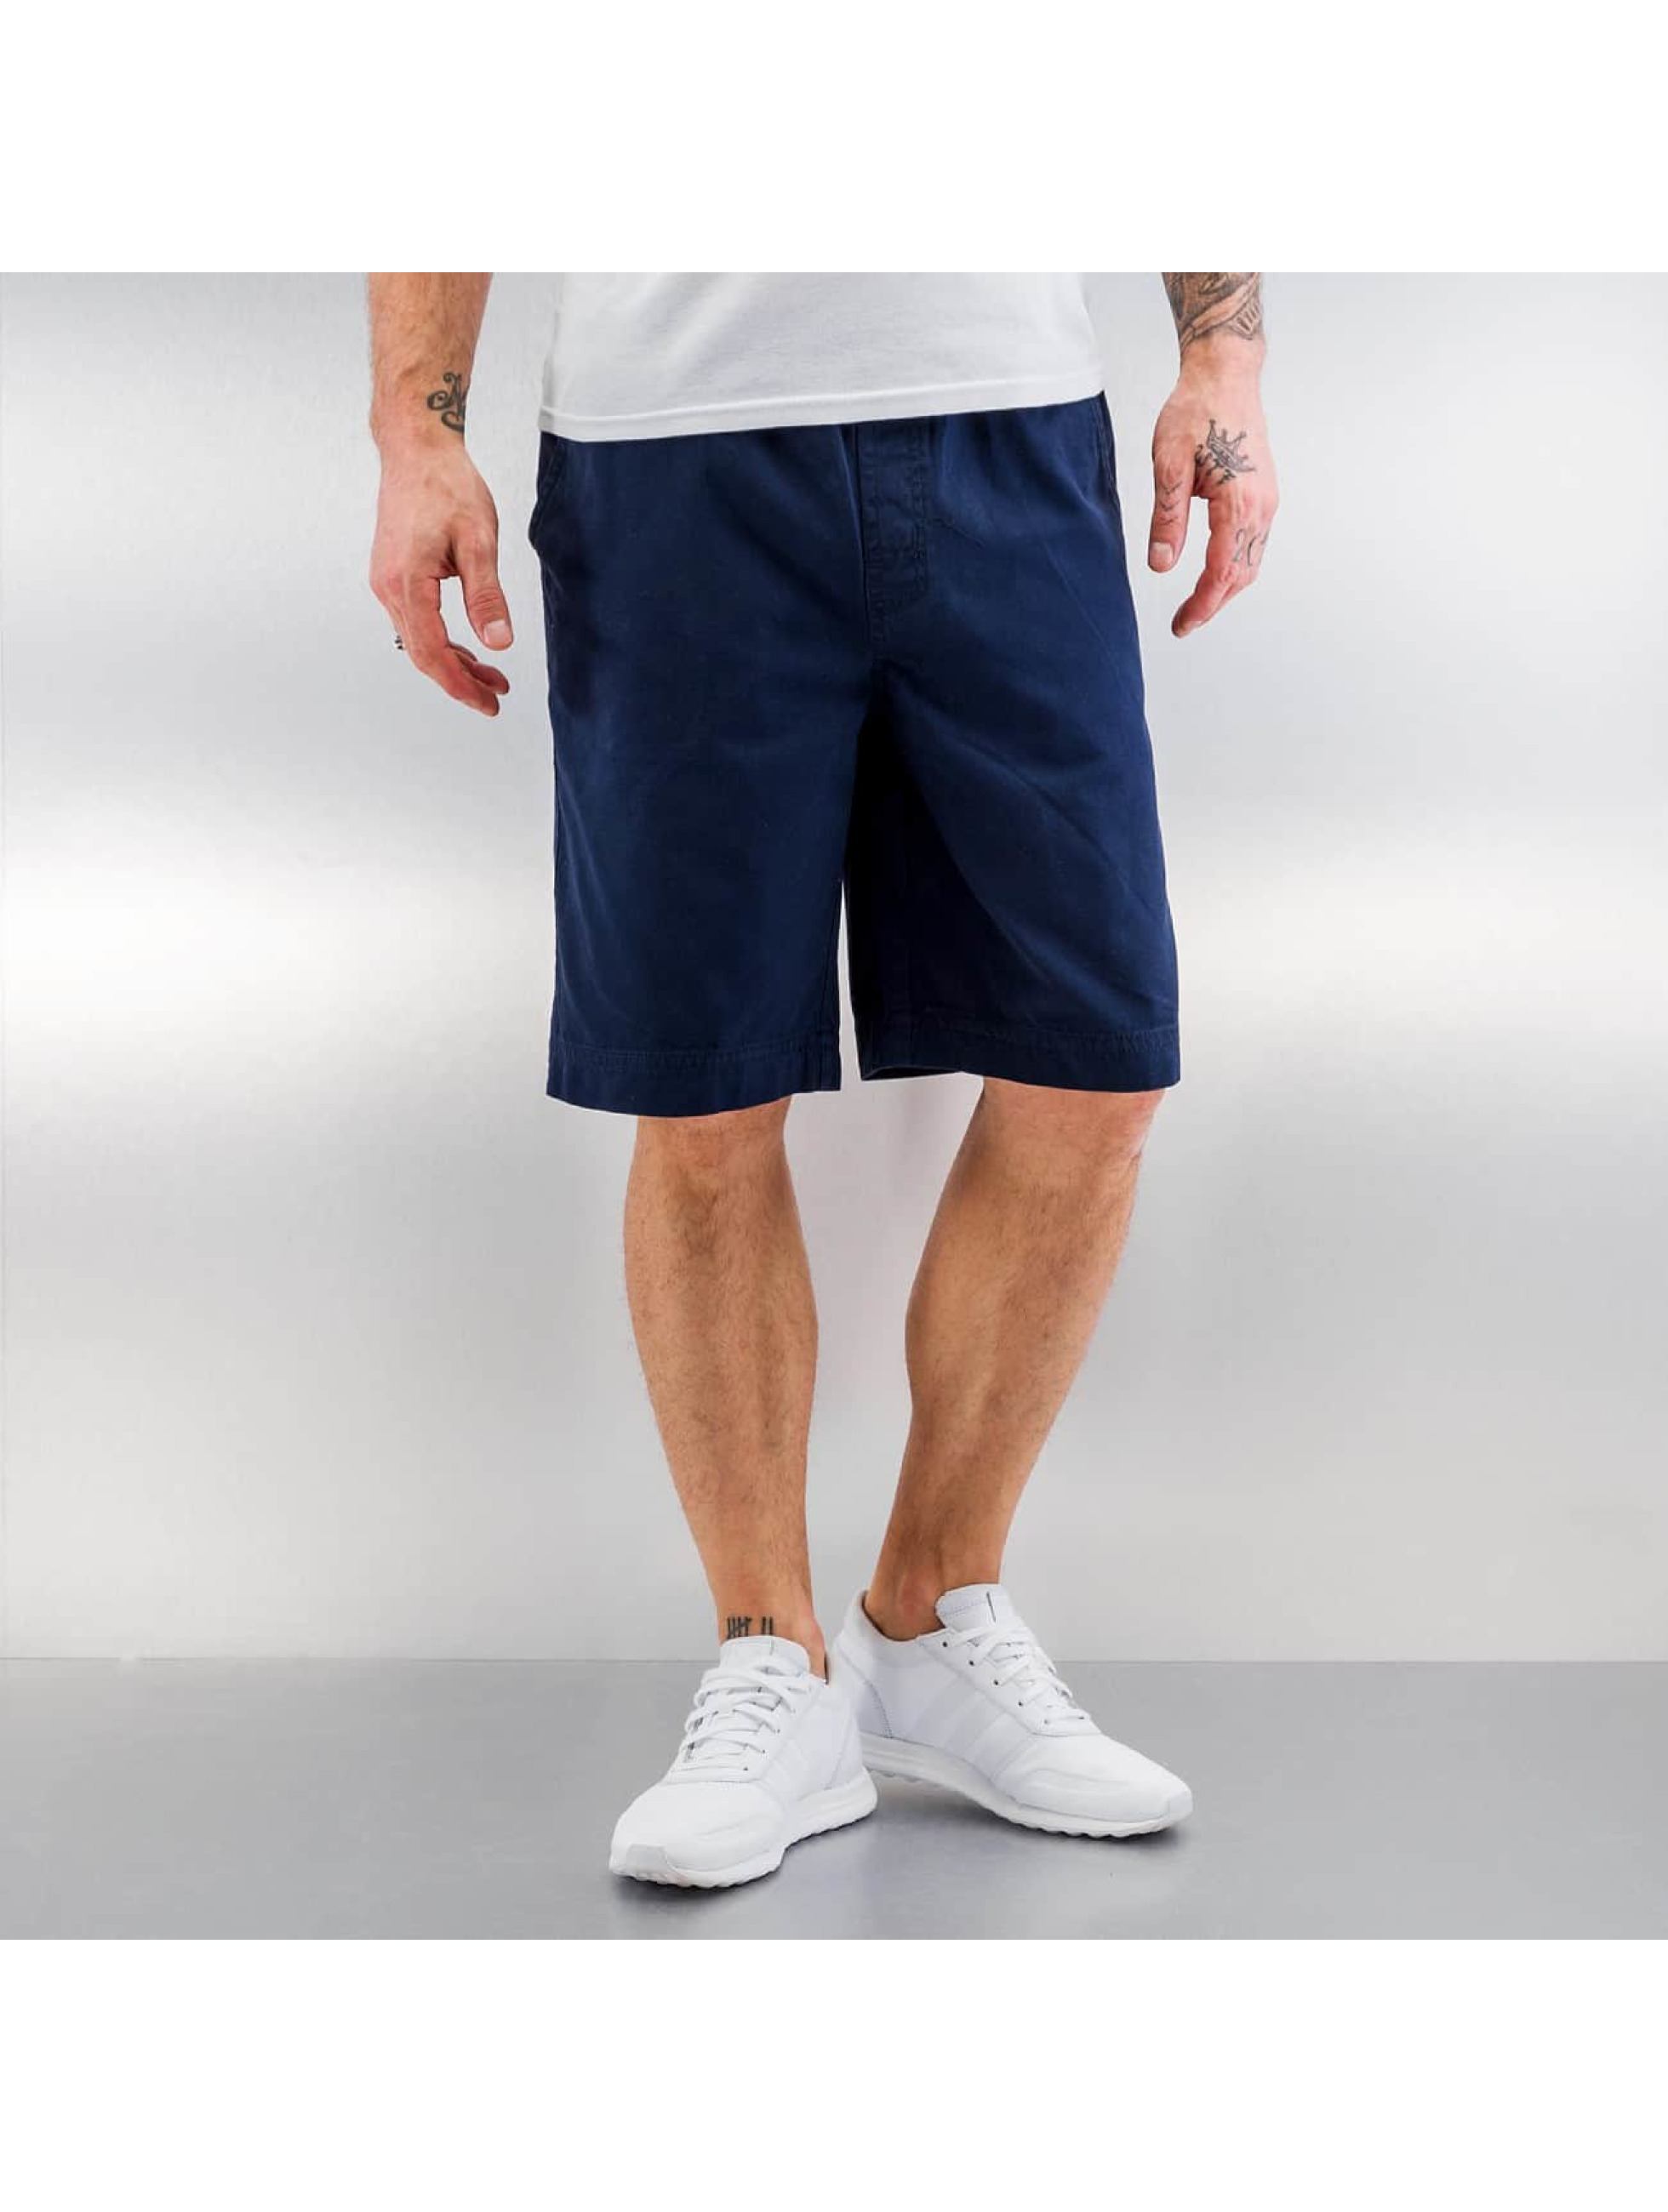 Amsterdenim Shorts Bert blau